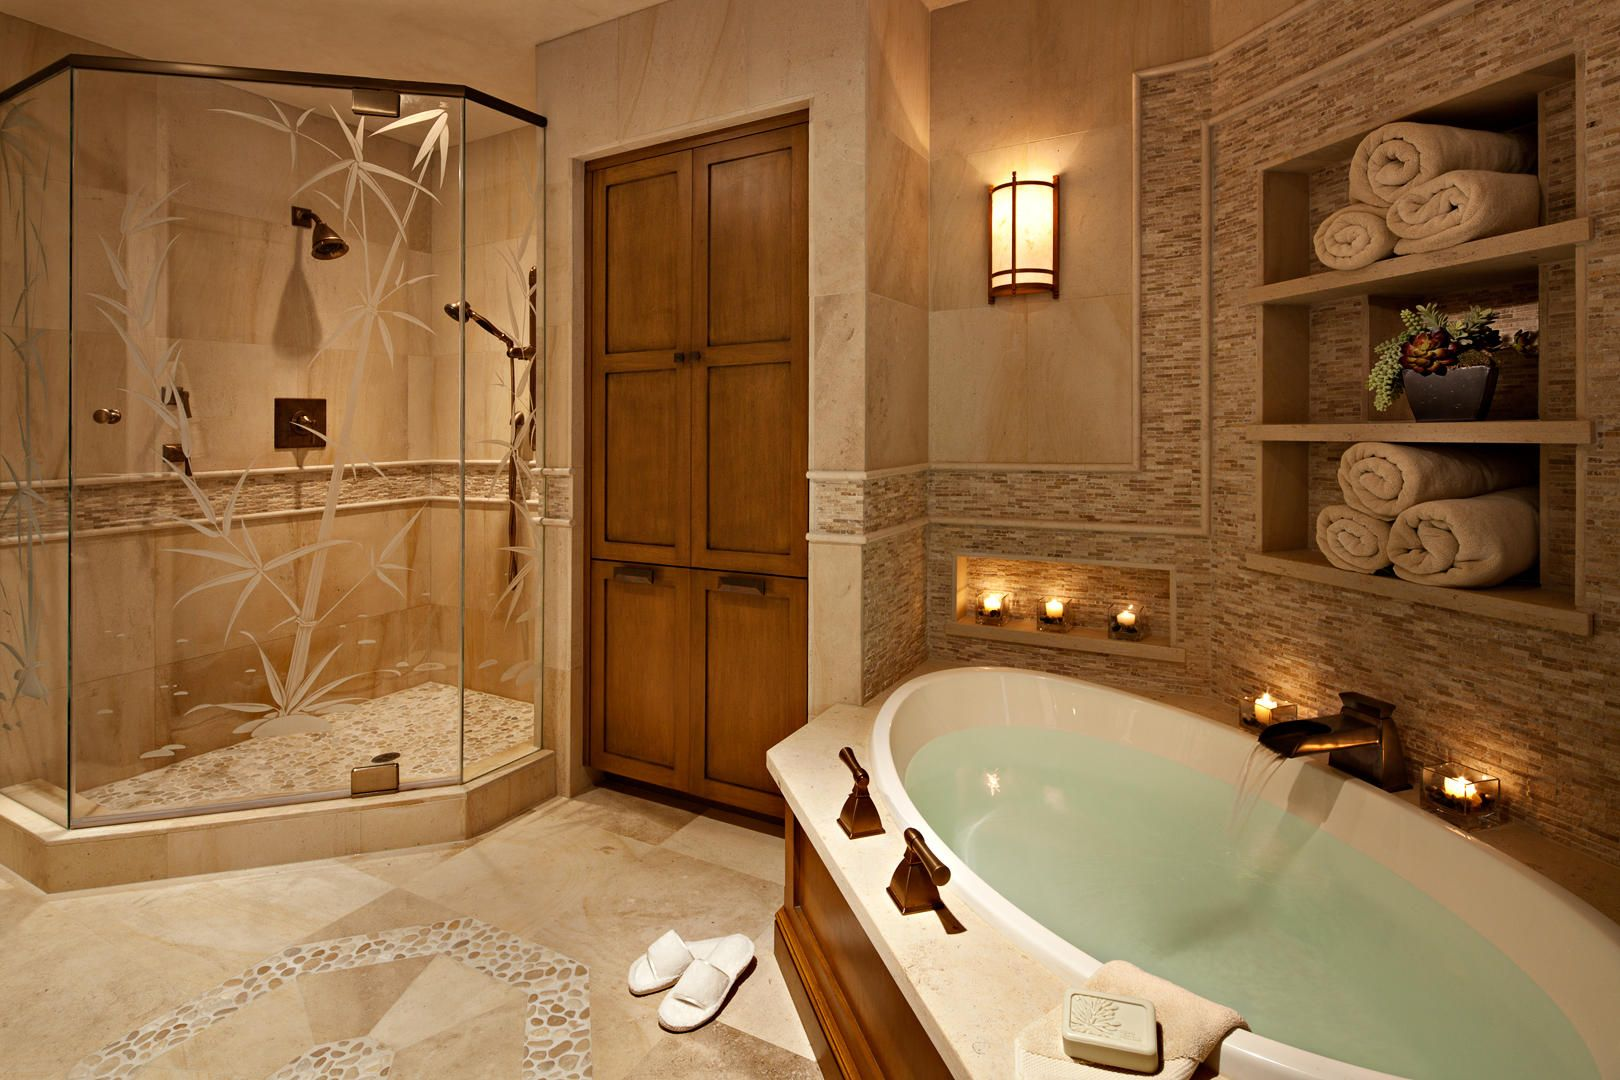 Spa Themed Bathroom Zampco – Spa Style Bathroom